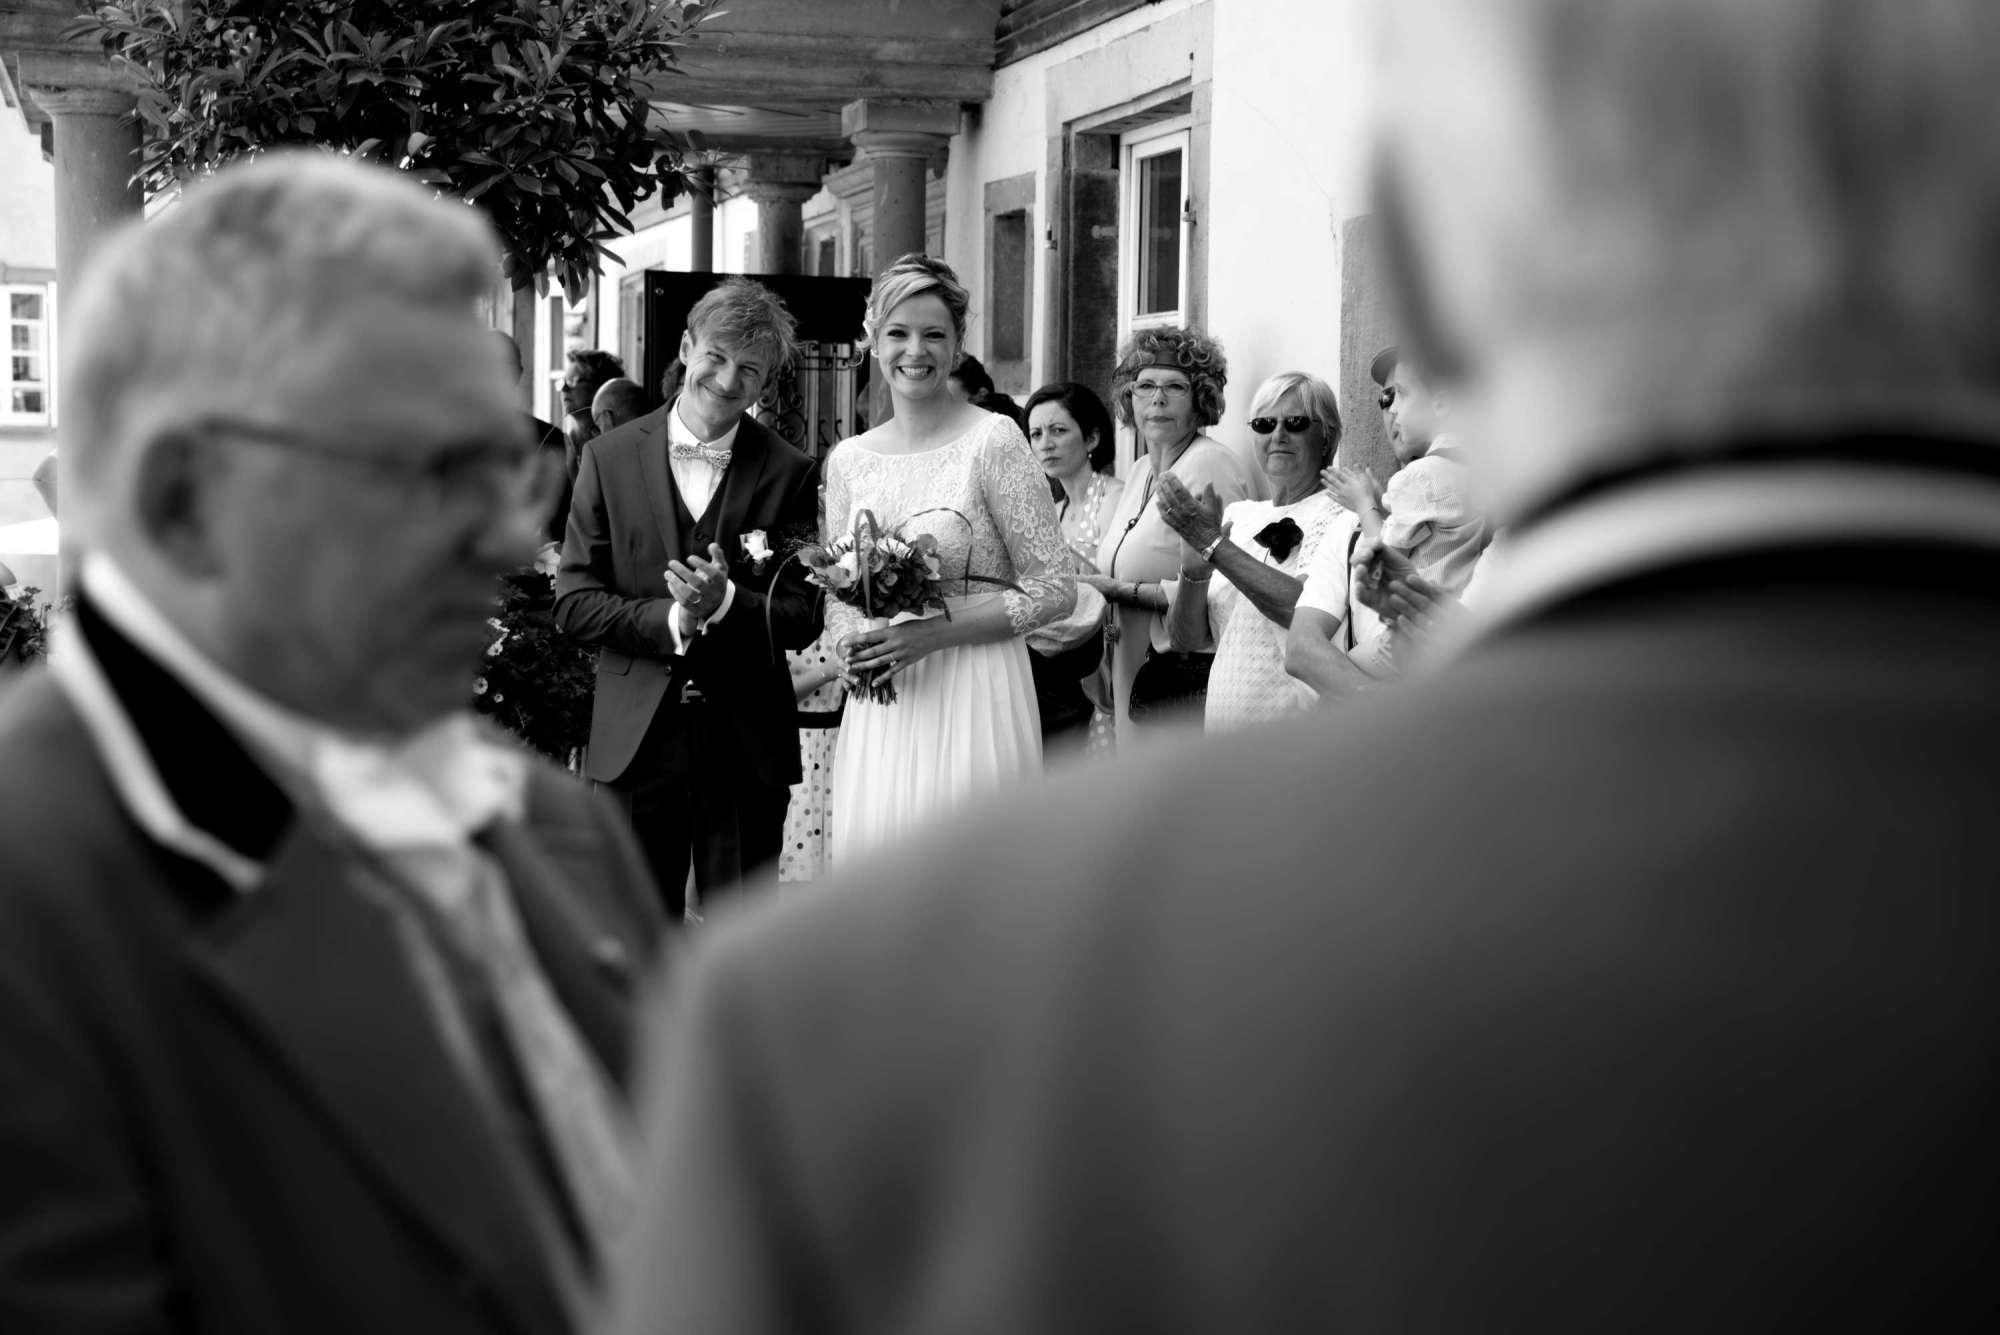 Katia Roth Photographe Mariage Barr Alsace